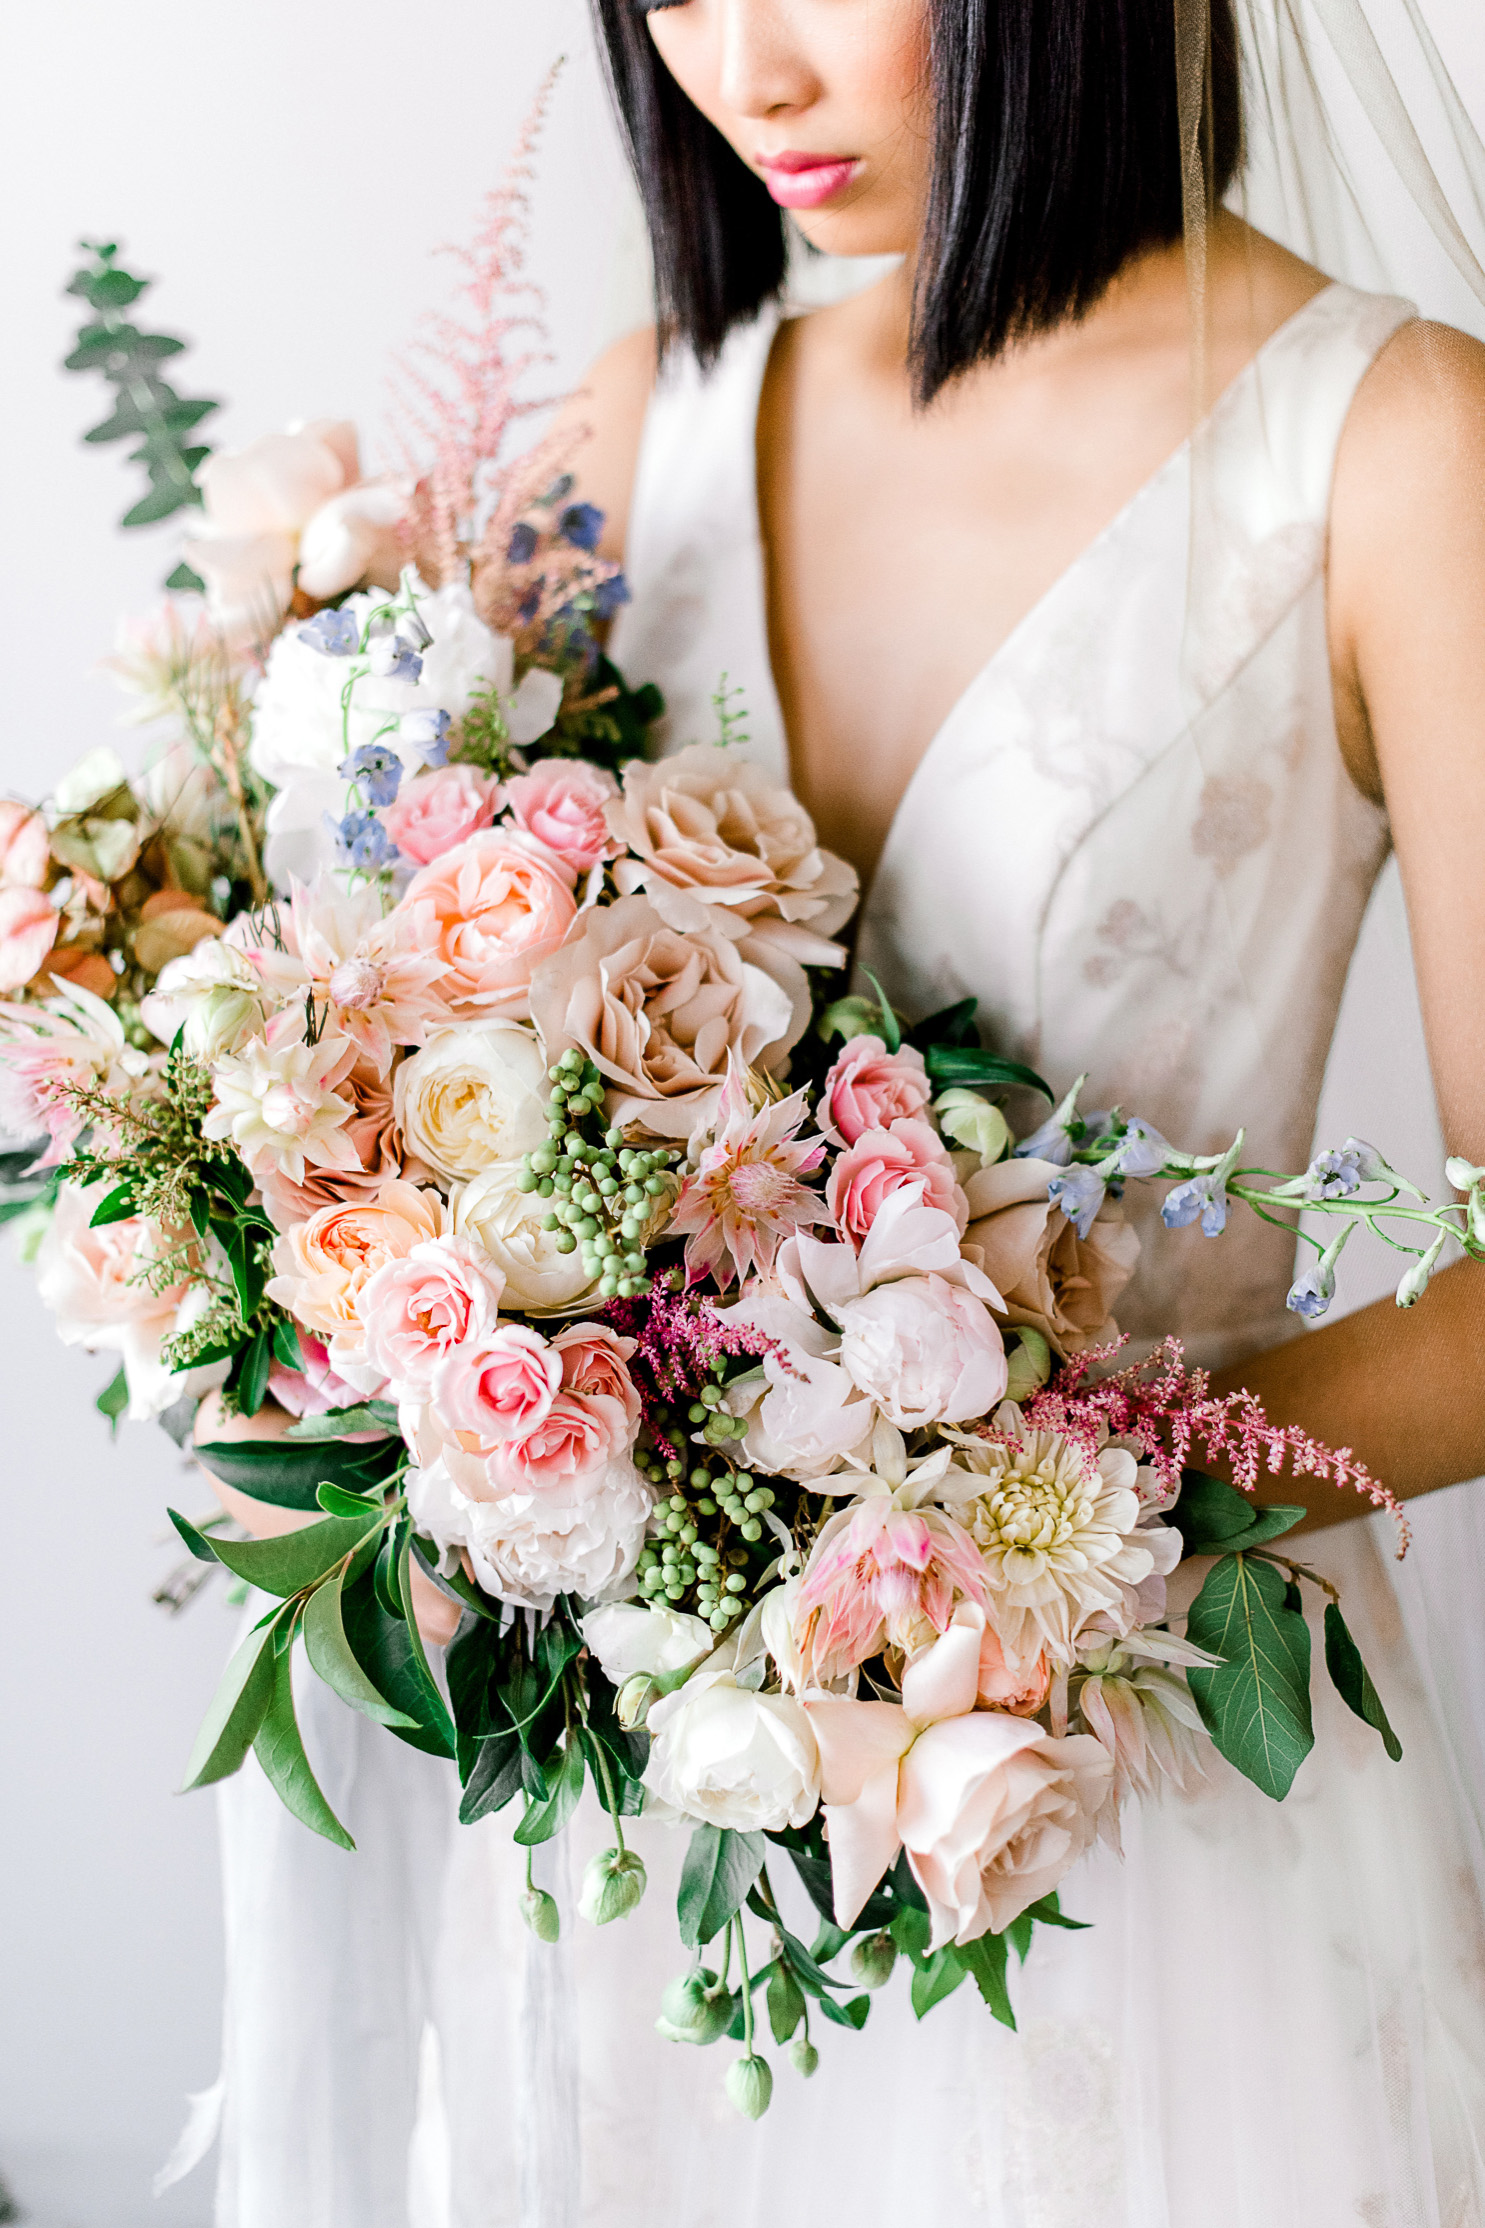 Houston-Wedding-Photographer-Editorial-Fine-Art-Film-Destination-Dallas-Texas-Mibellarosa-Josh-Dana-Fernandez-Photography-210.jpg